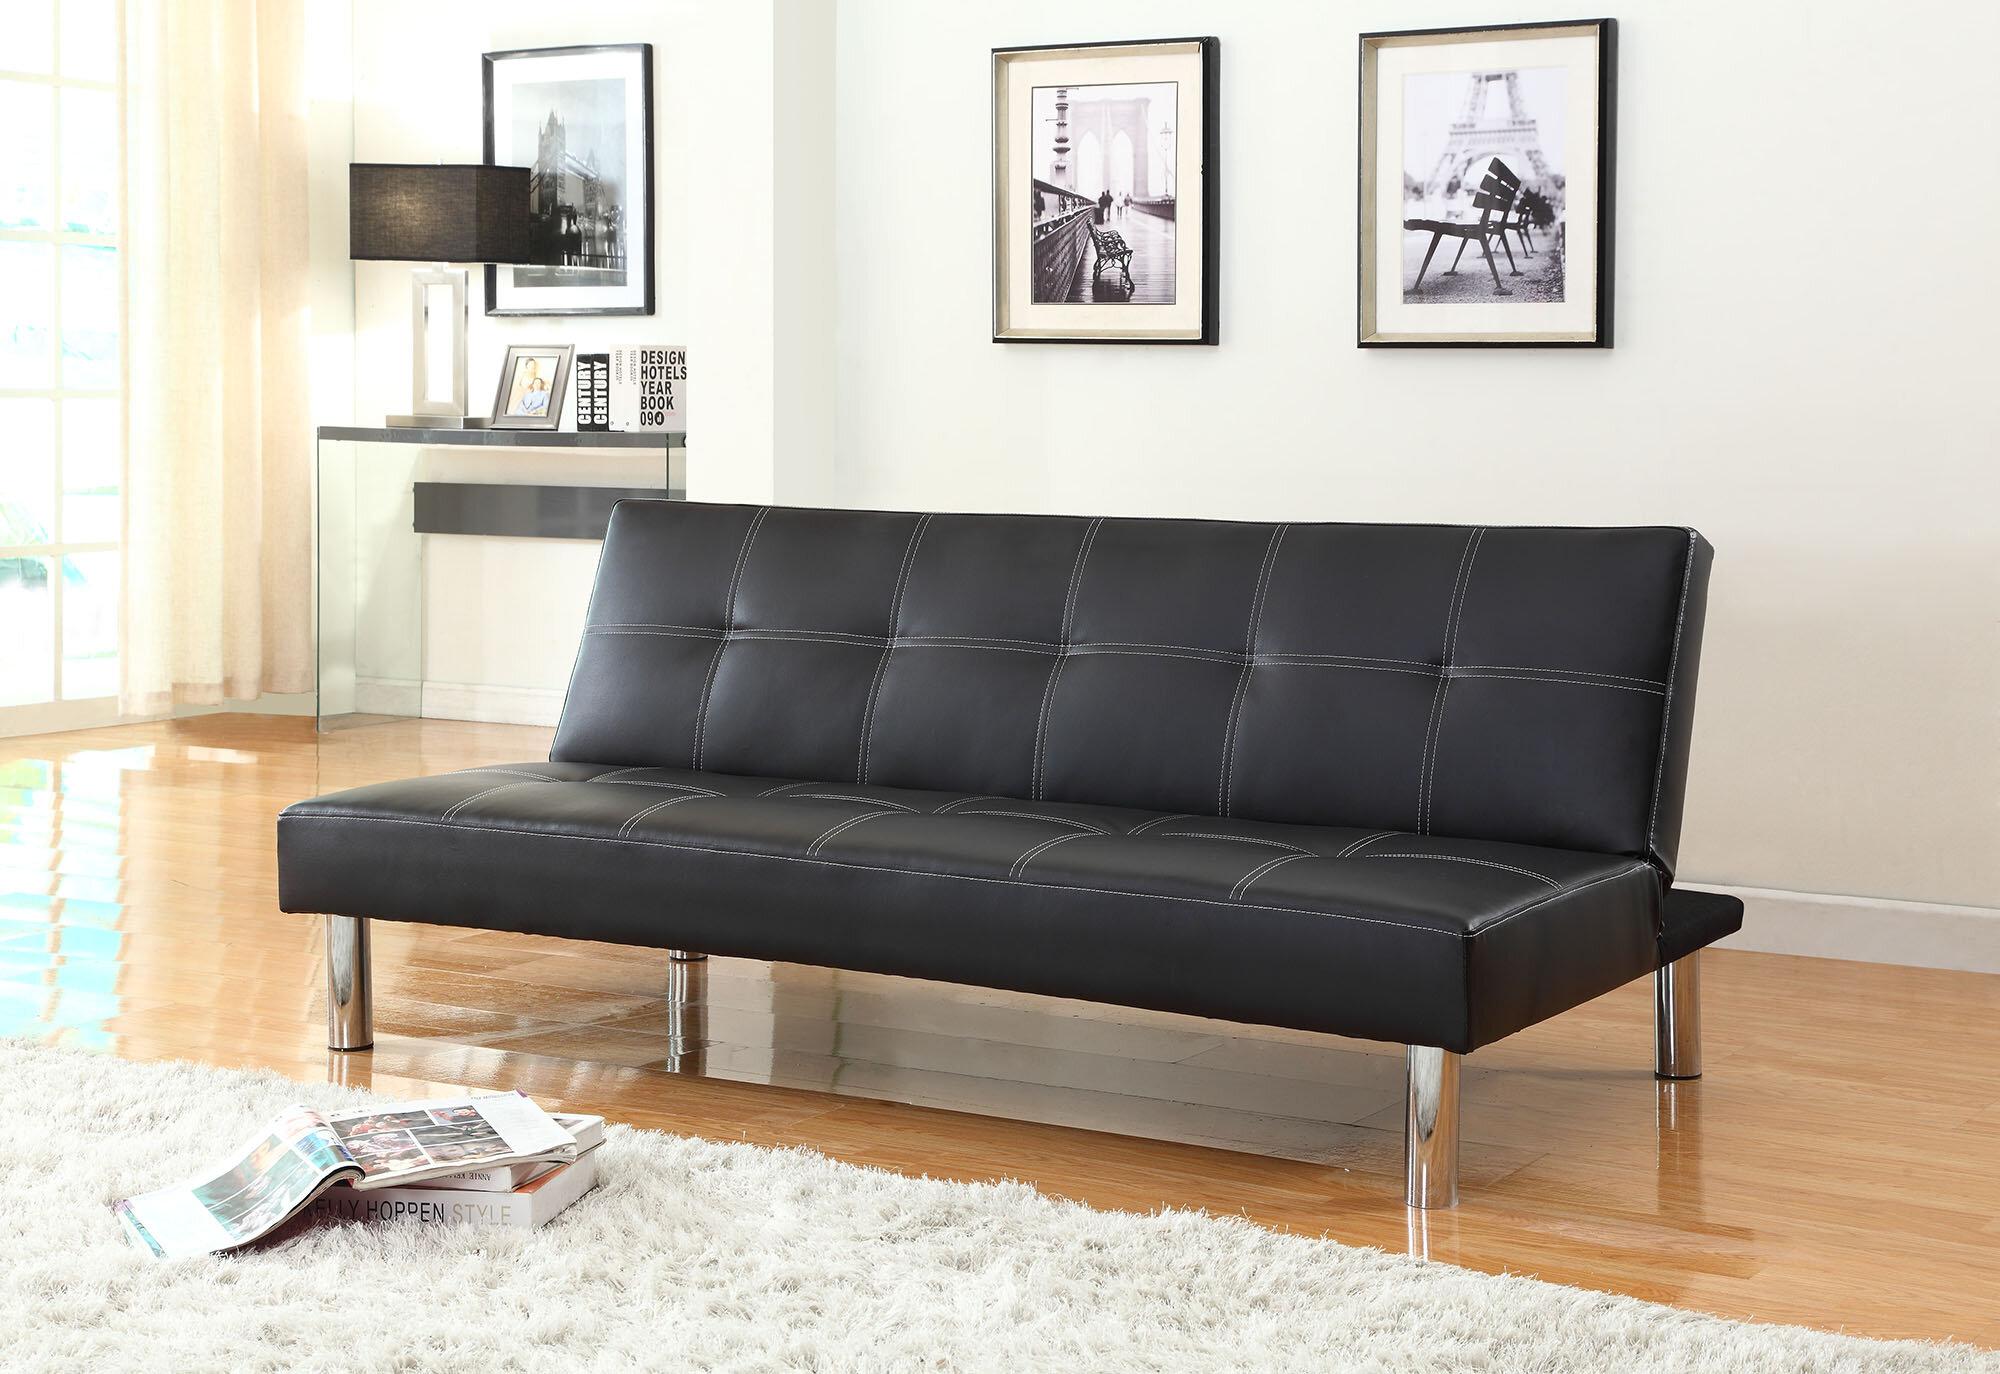 Exceptionnel NathanielHome Issac Futon Convertible Sofa U0026 Reviews | Wayfair